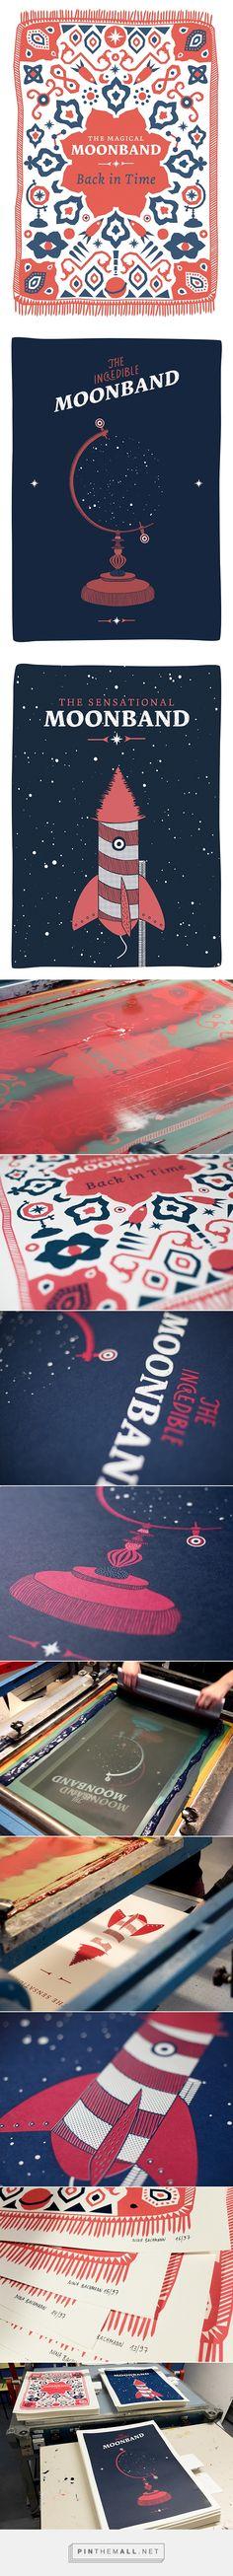 The Moonband - Screen Printed Gig Posters by Nina Bachman